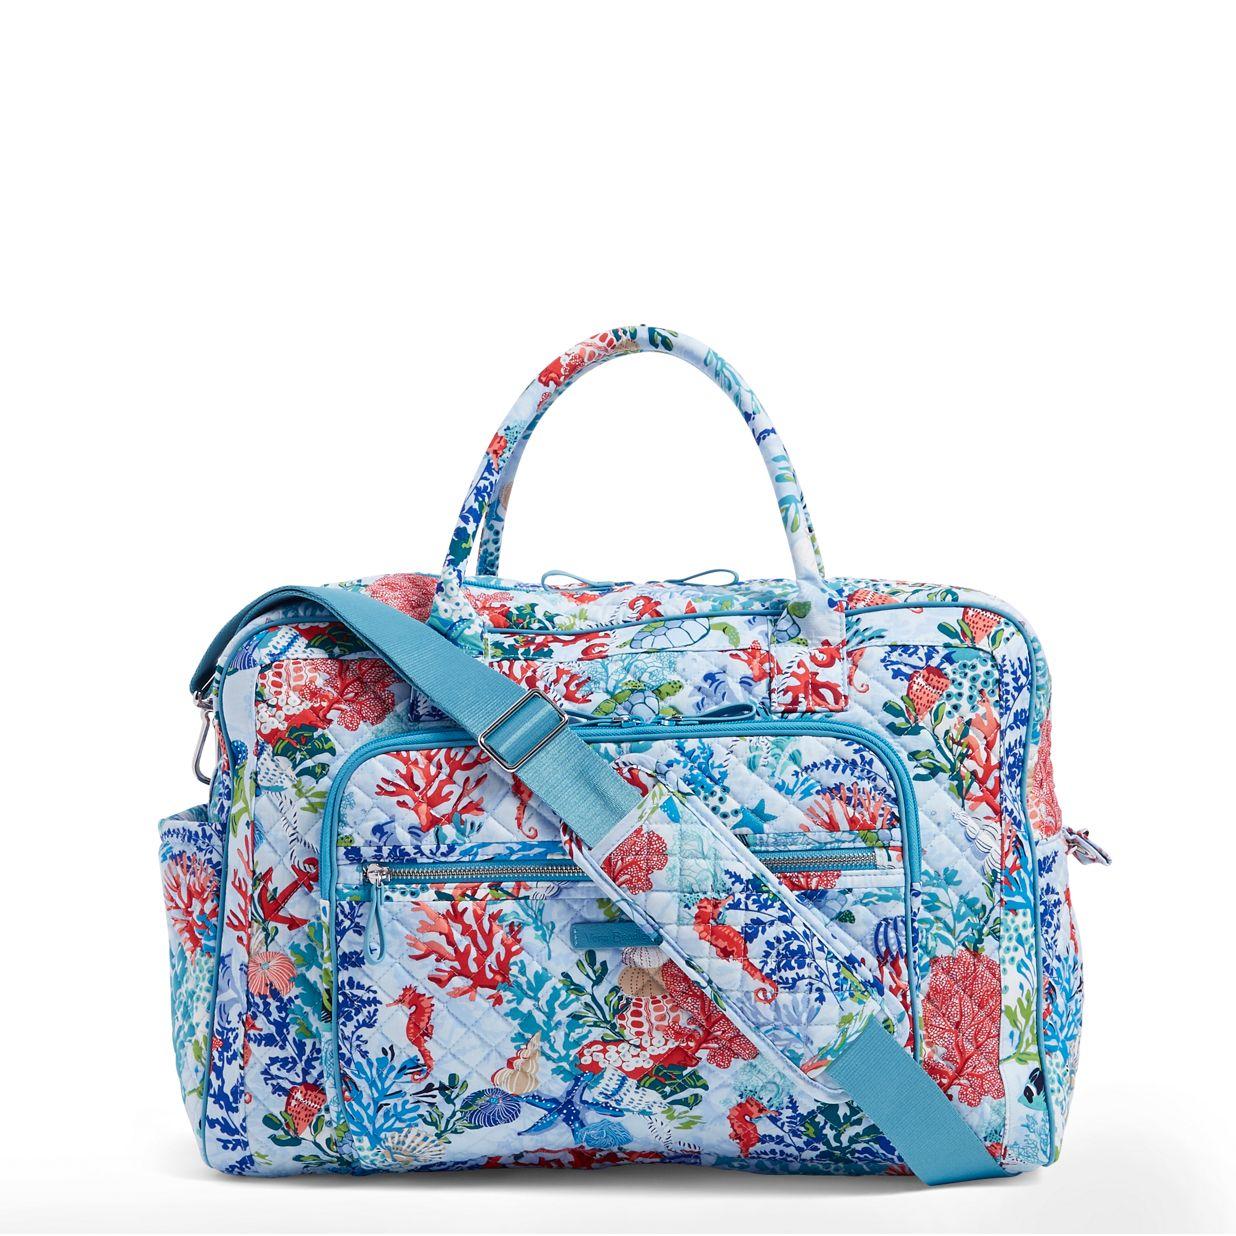 2d07d27a0 Iconic Weekender Travel Bag | Vera Bradley